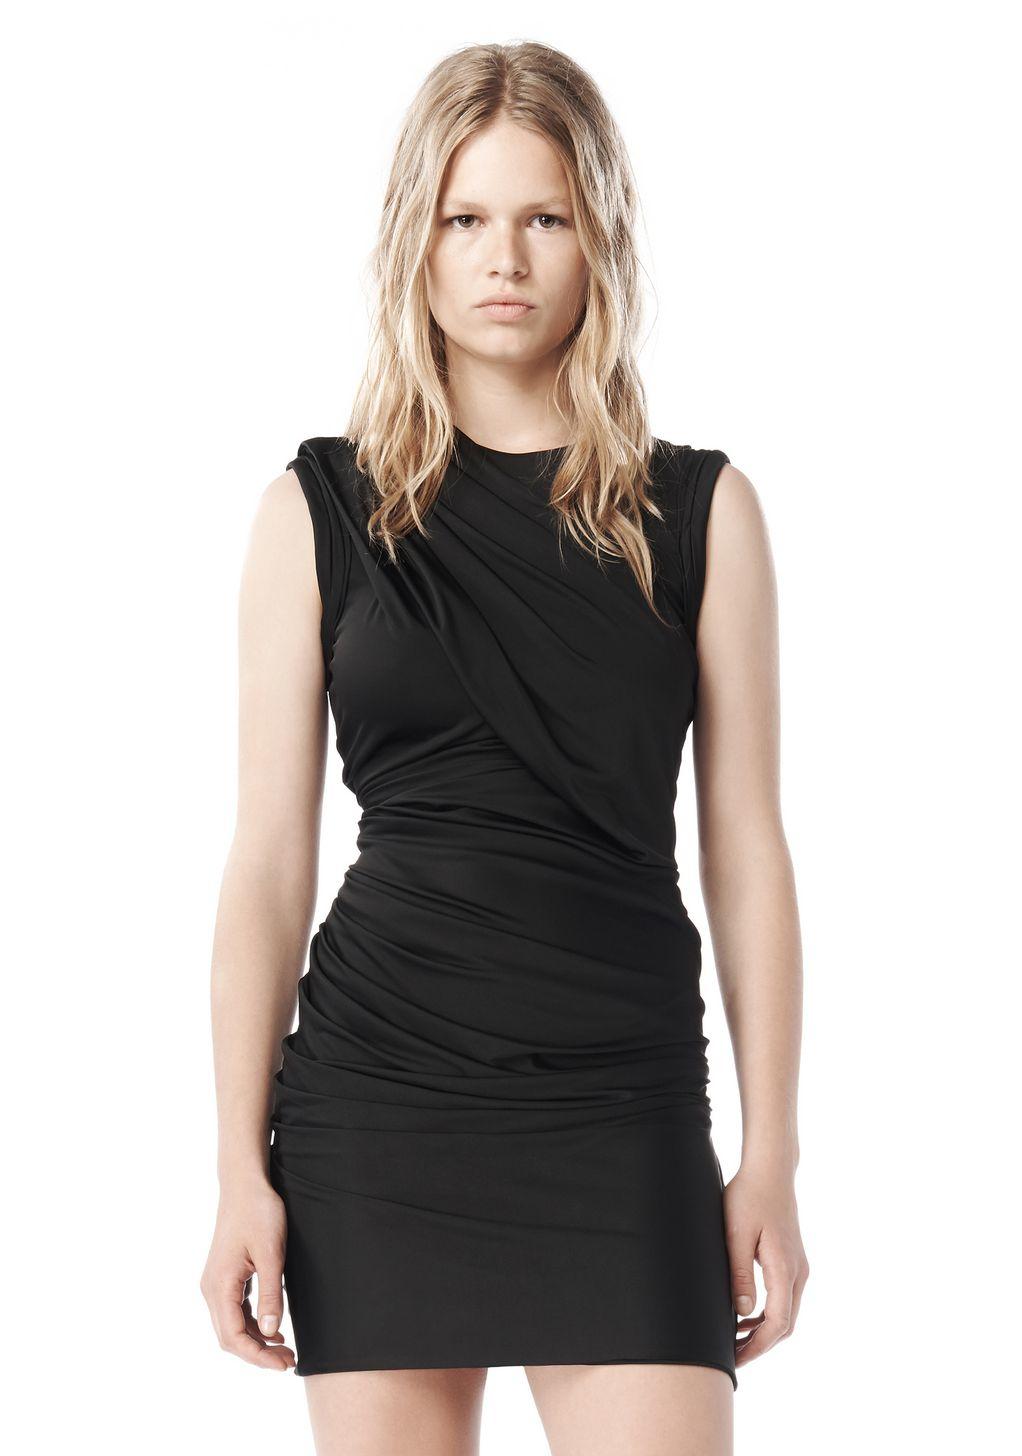 Lyst Alexander Wang Spring 2009 Draped Jersey Dress In Black